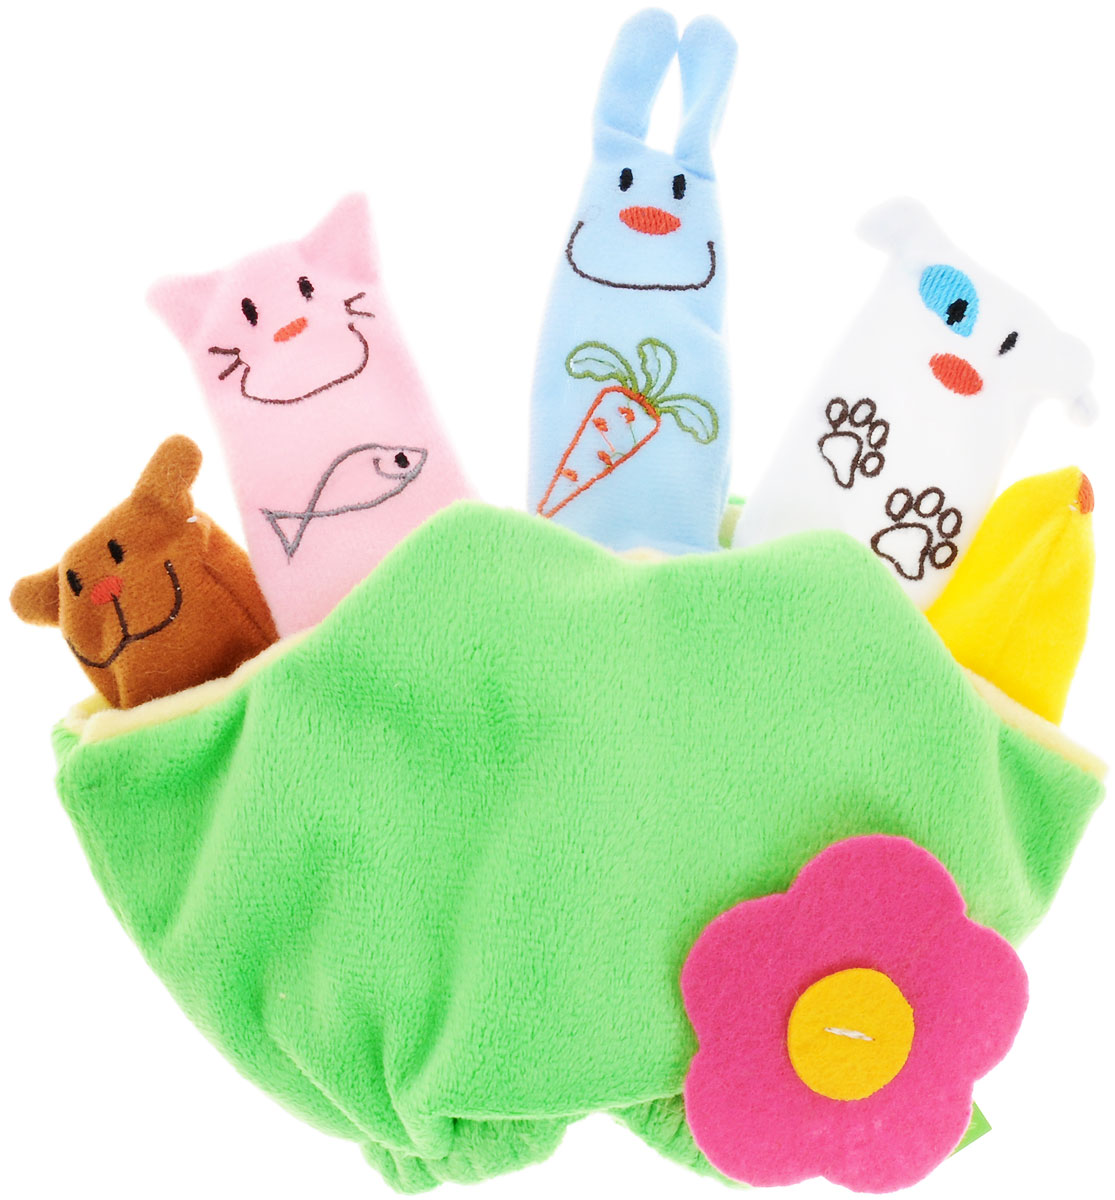 Mommy Love Развивающая игрушка Полянка сортер mommy love весёлые фигурки